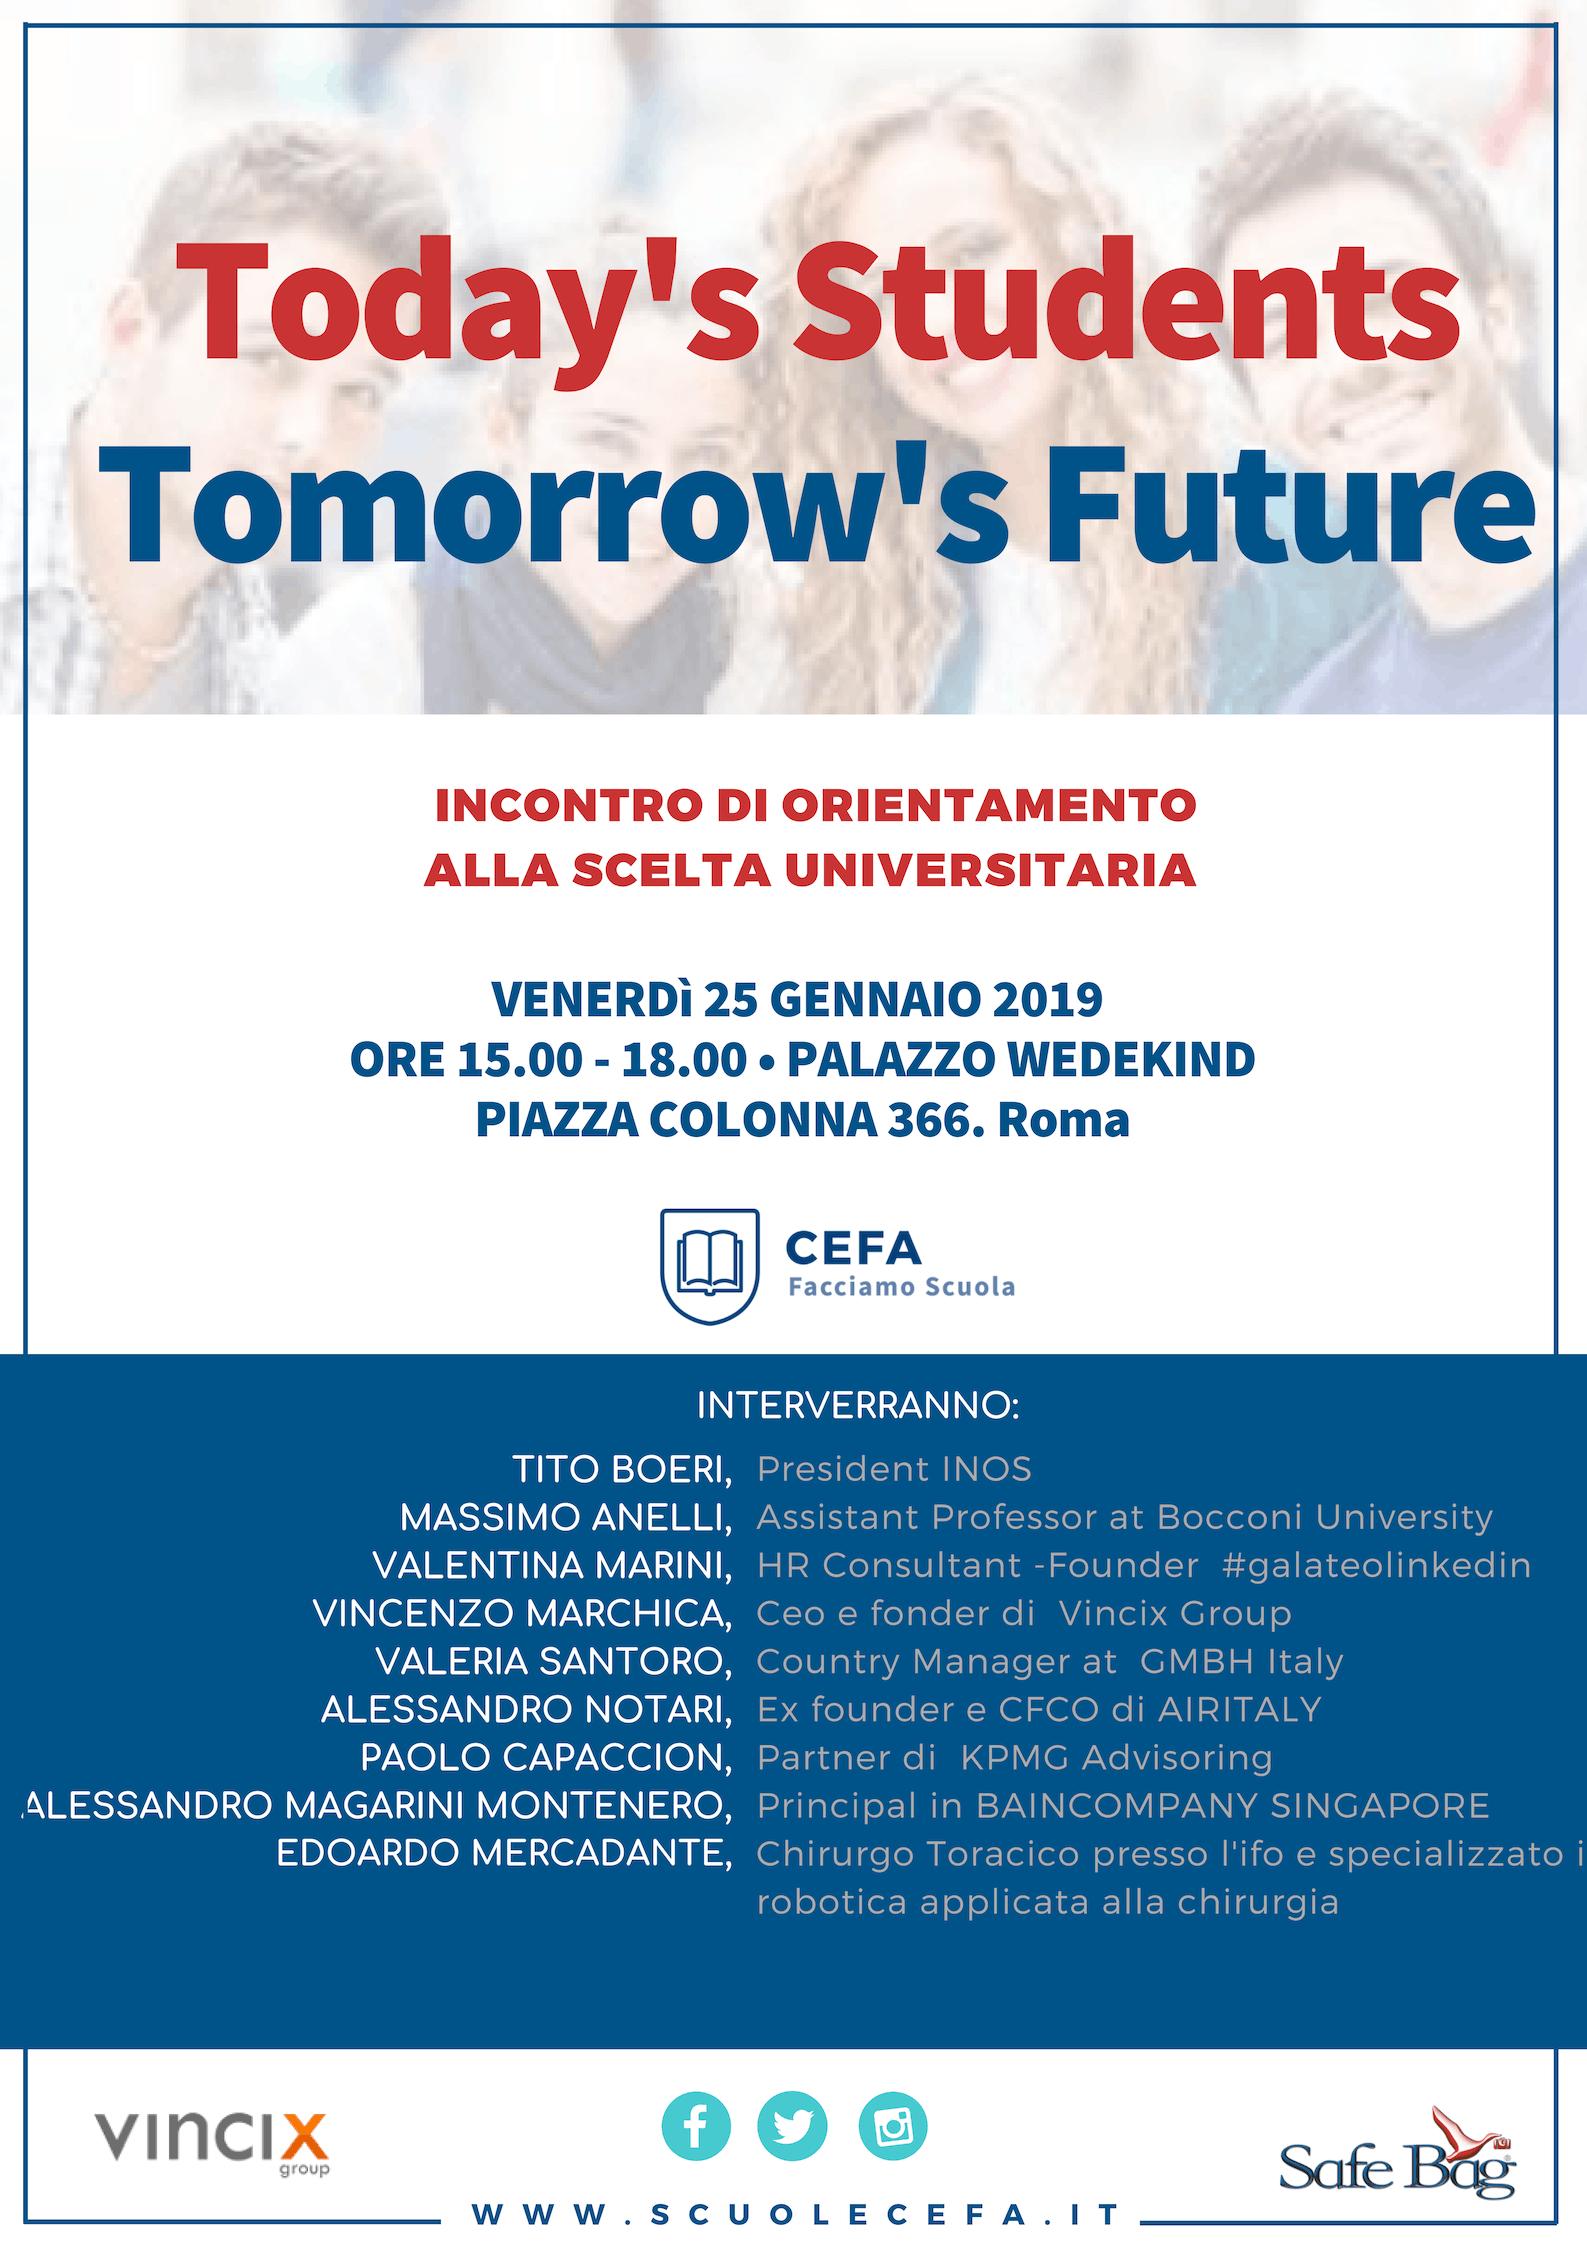 Today's Students Tomorrow's Future